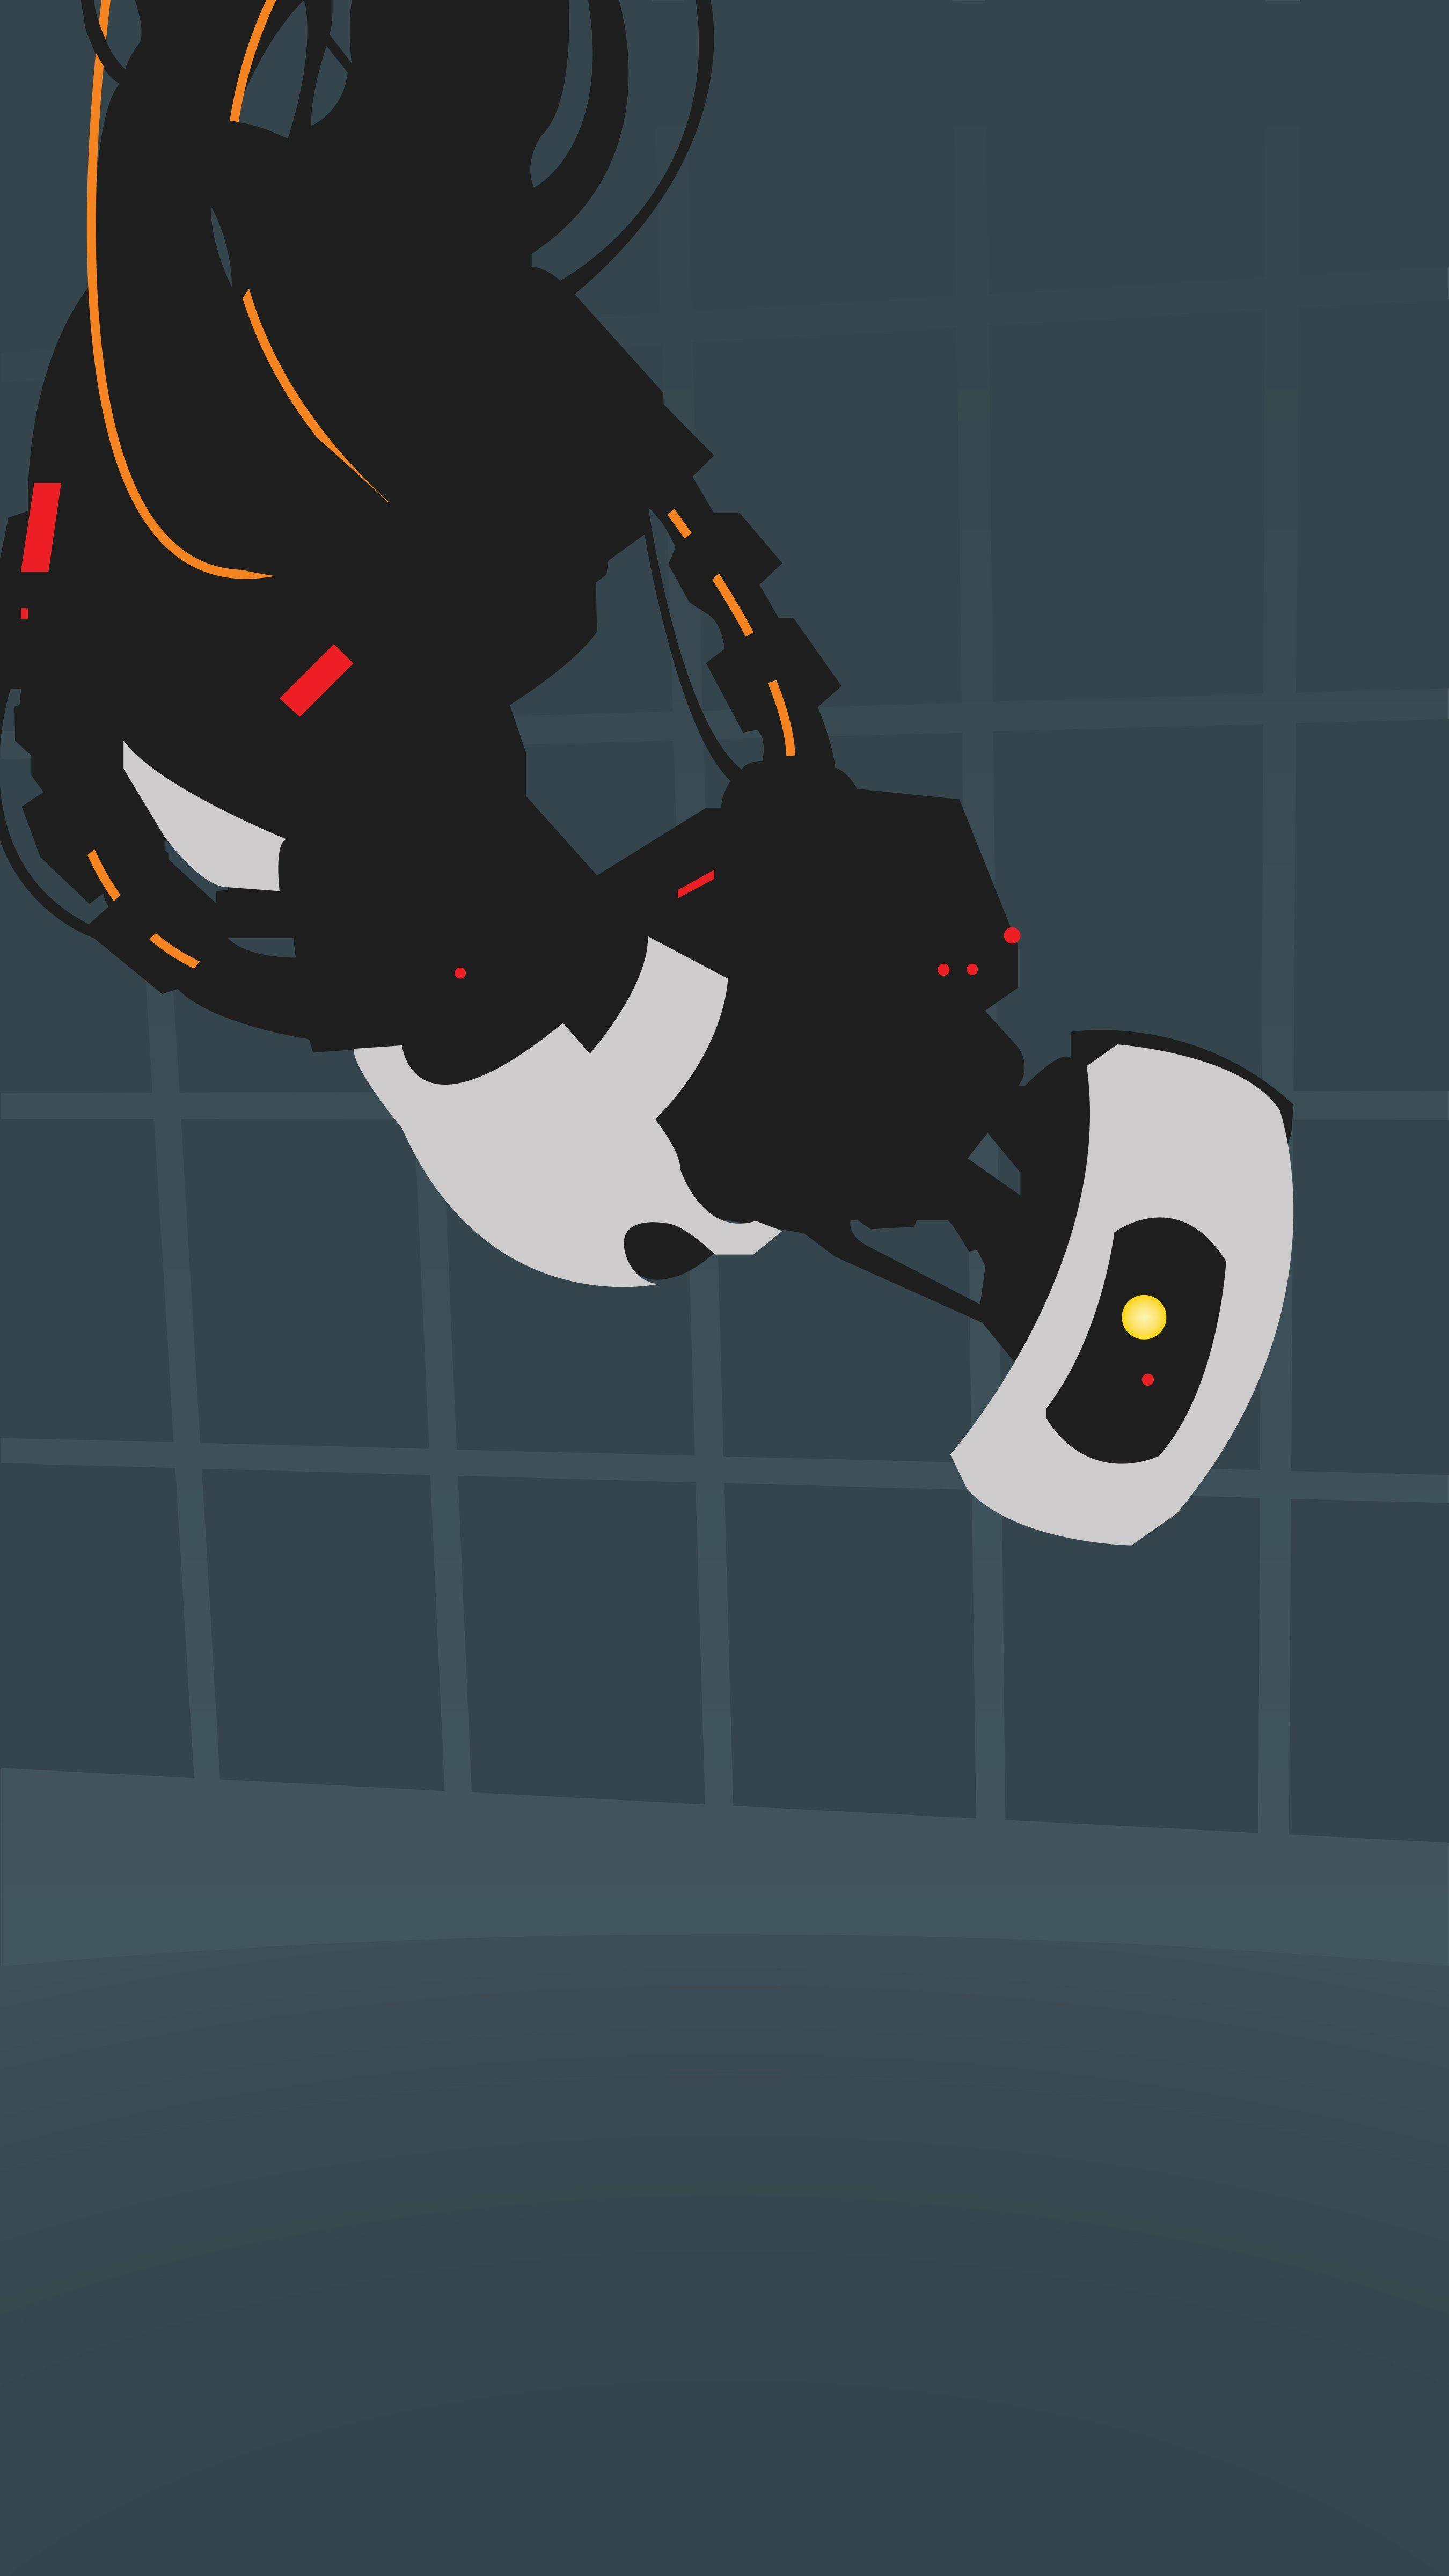 Portal 2 Phone Wallpapers On Wallpaperdog